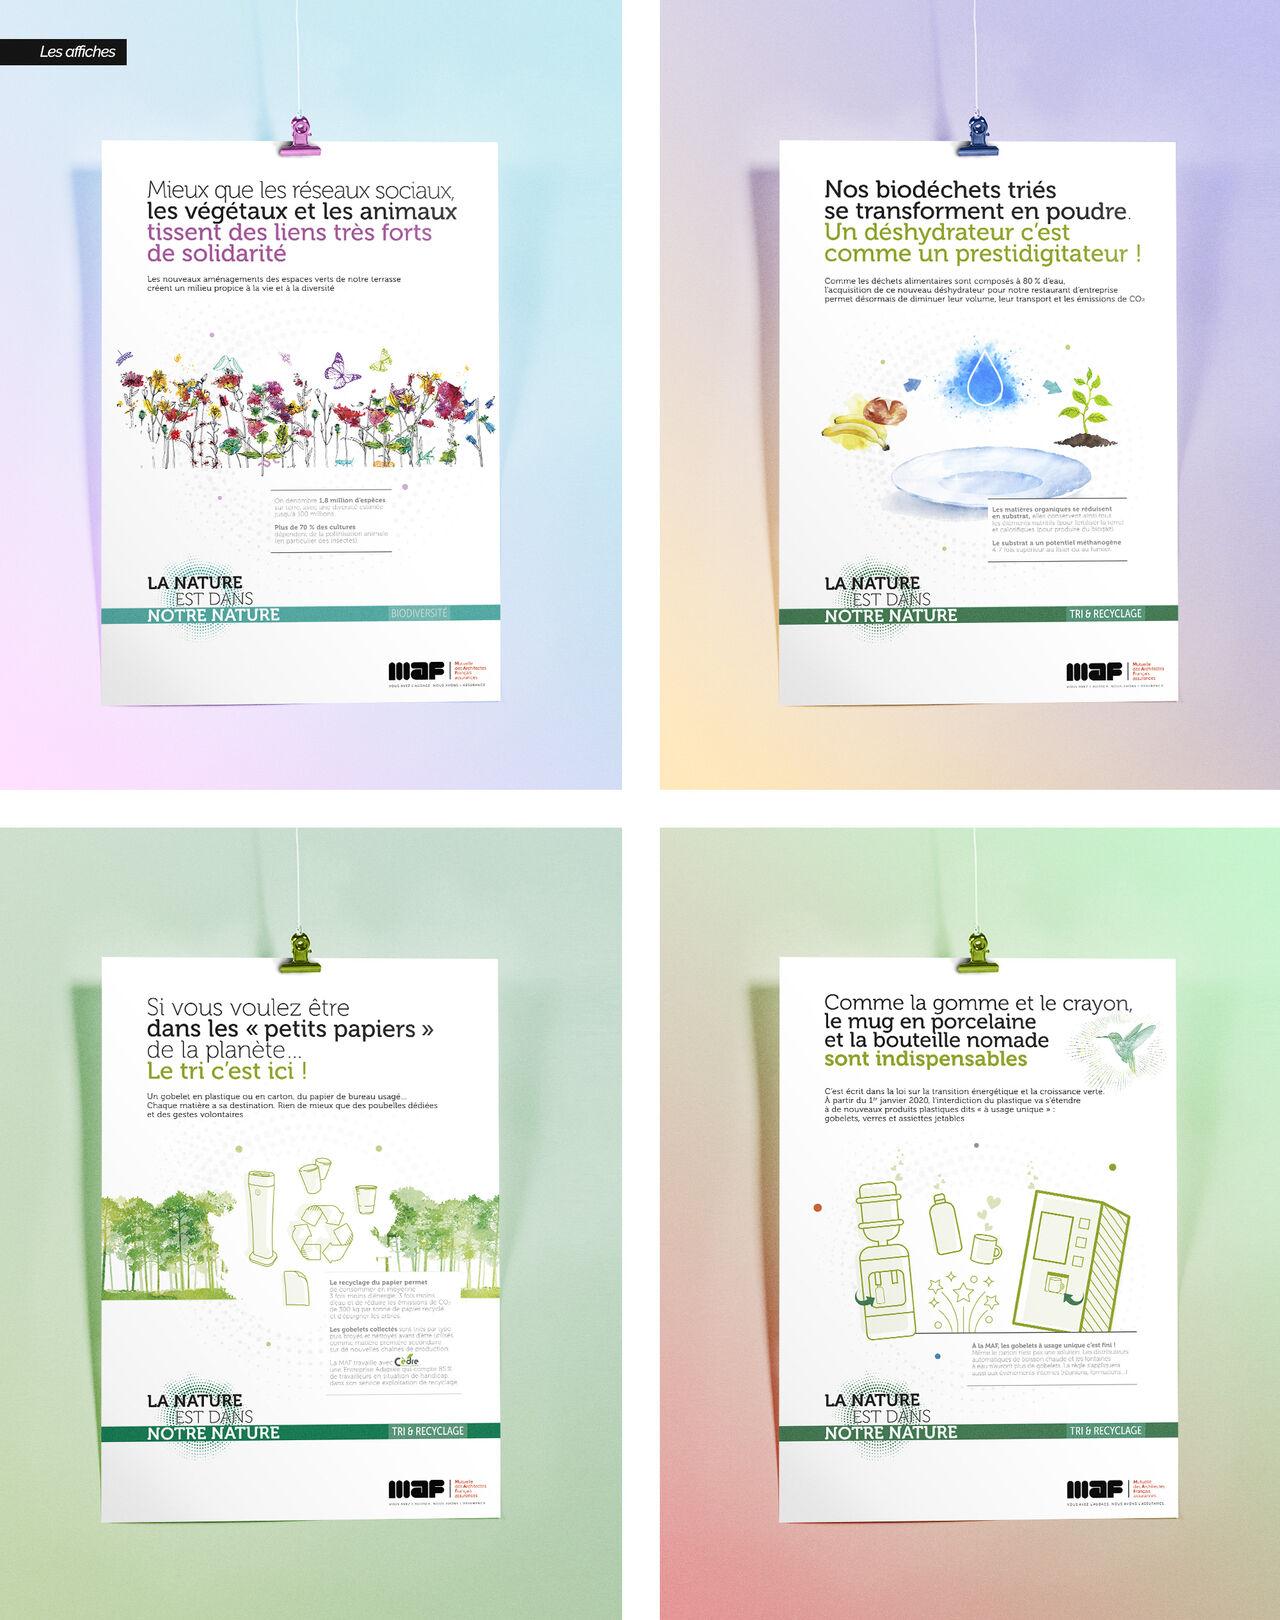 L'audacieuse campagne environnement MAF